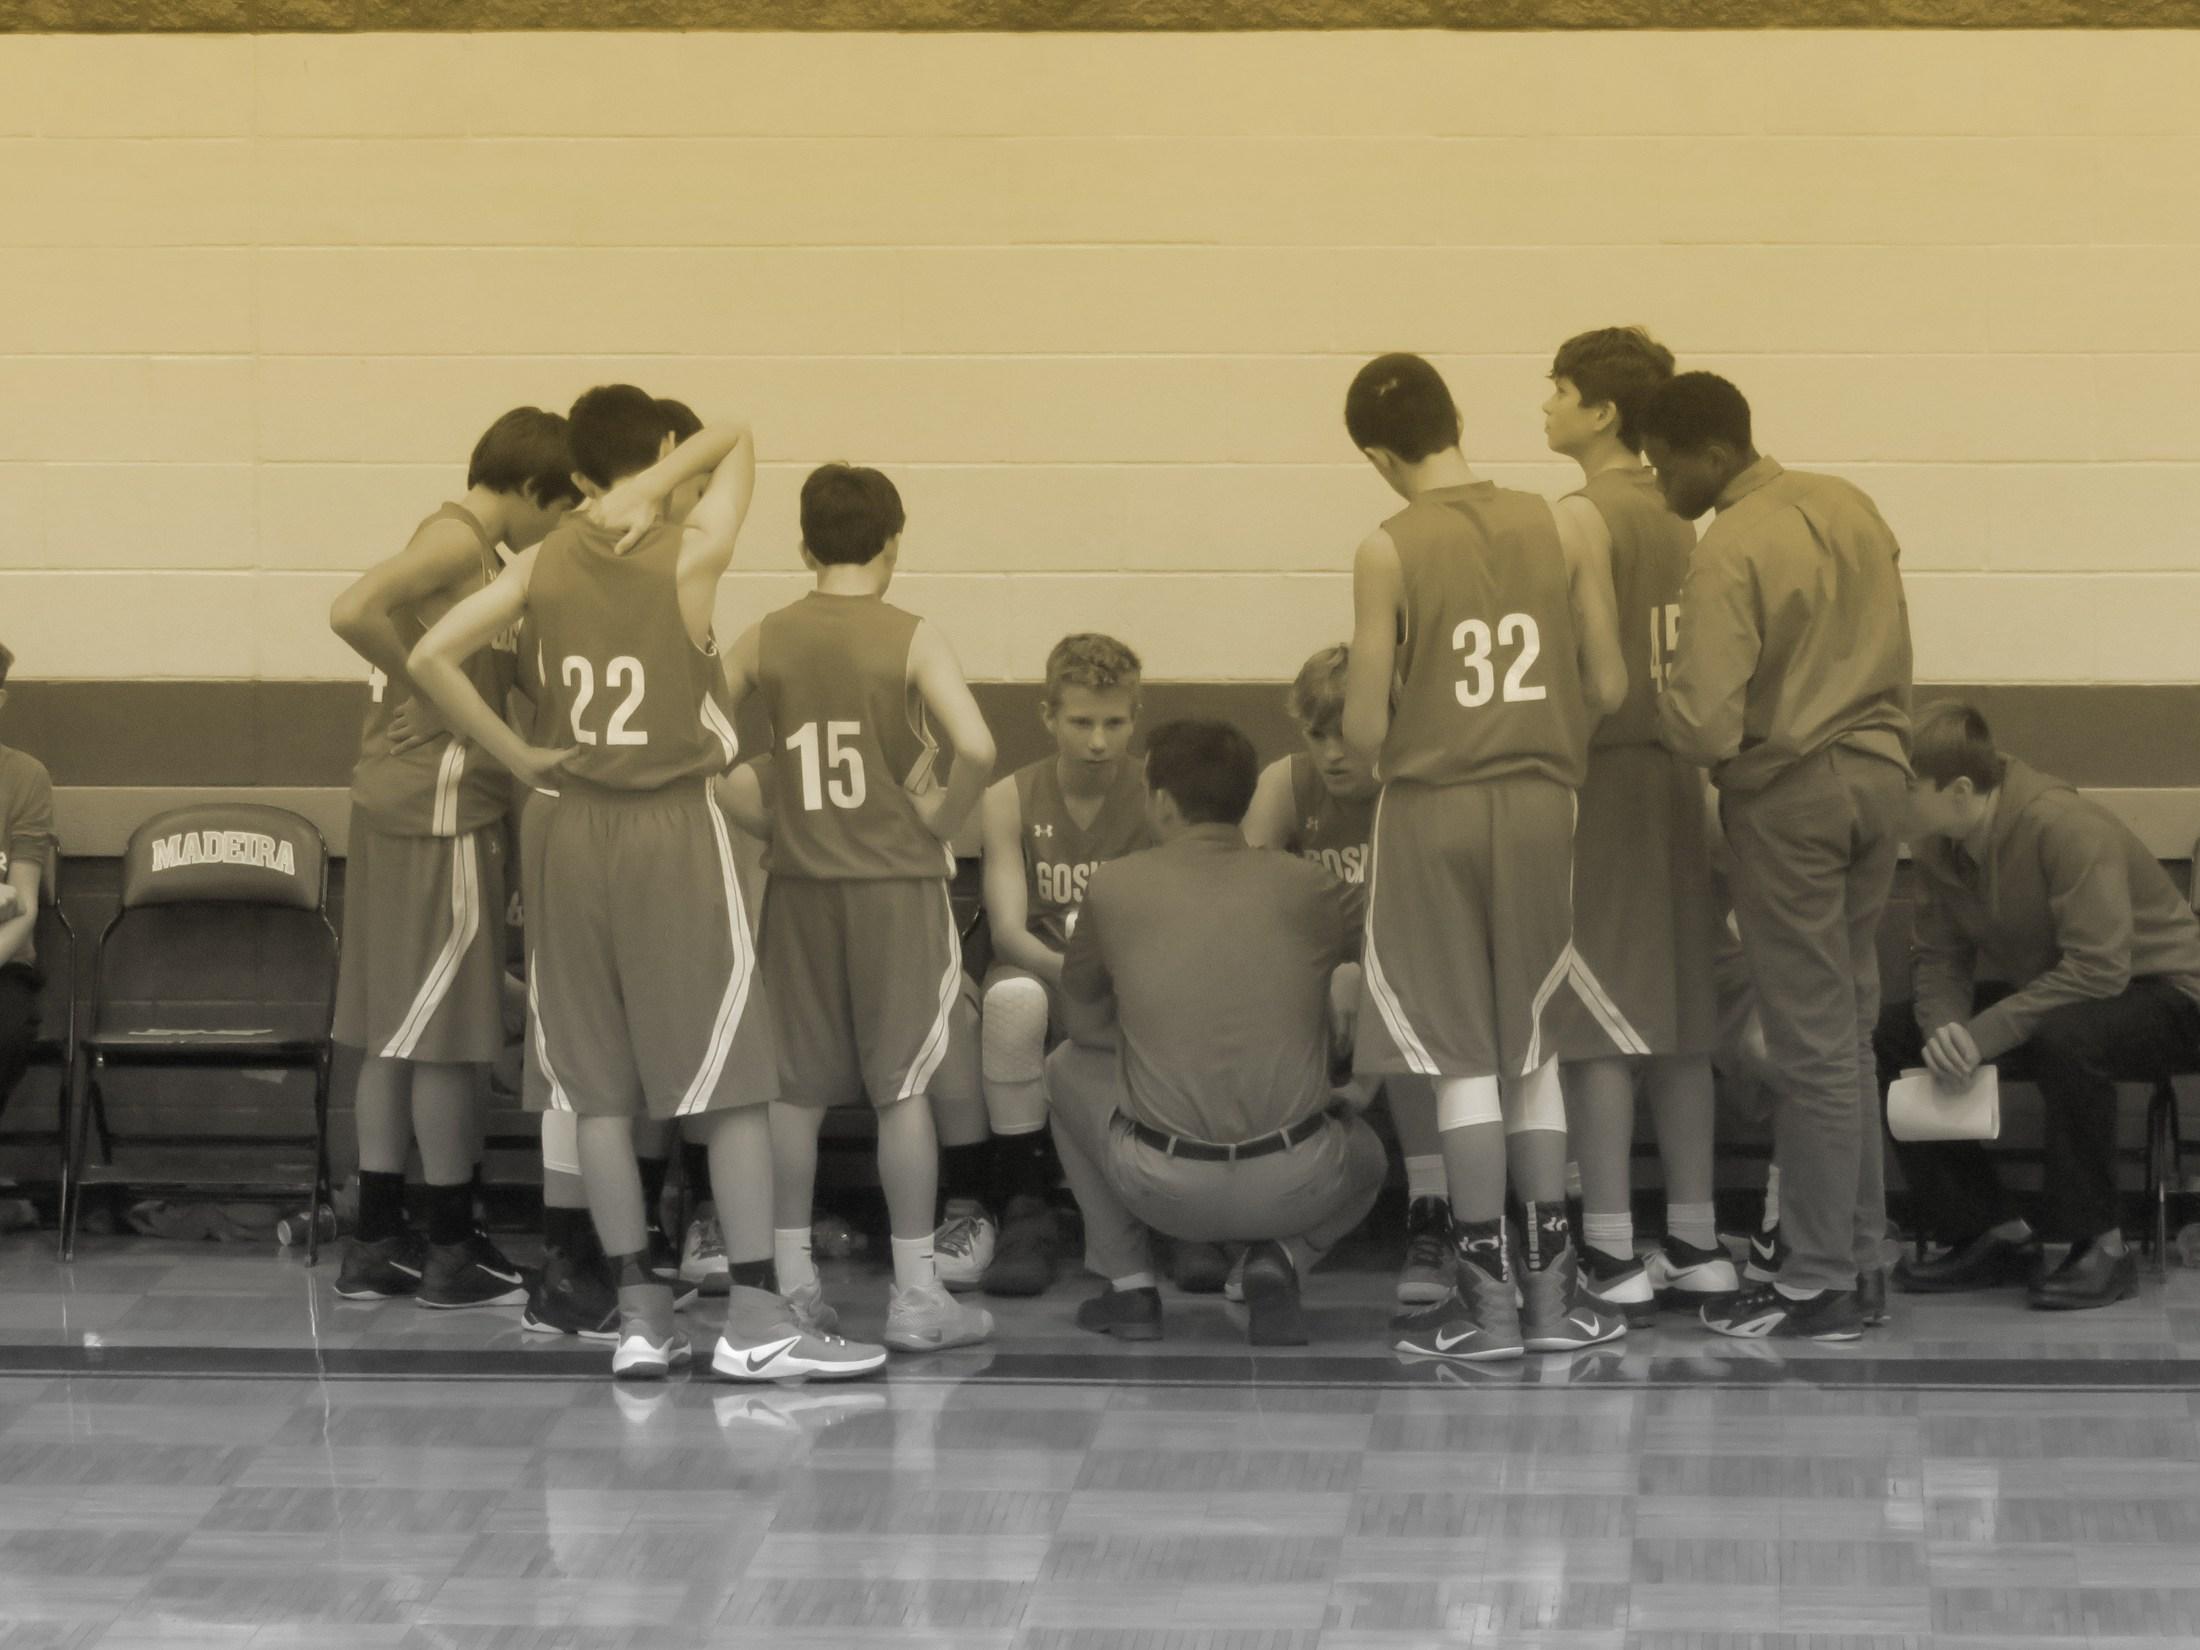 8th grade boys basketball team